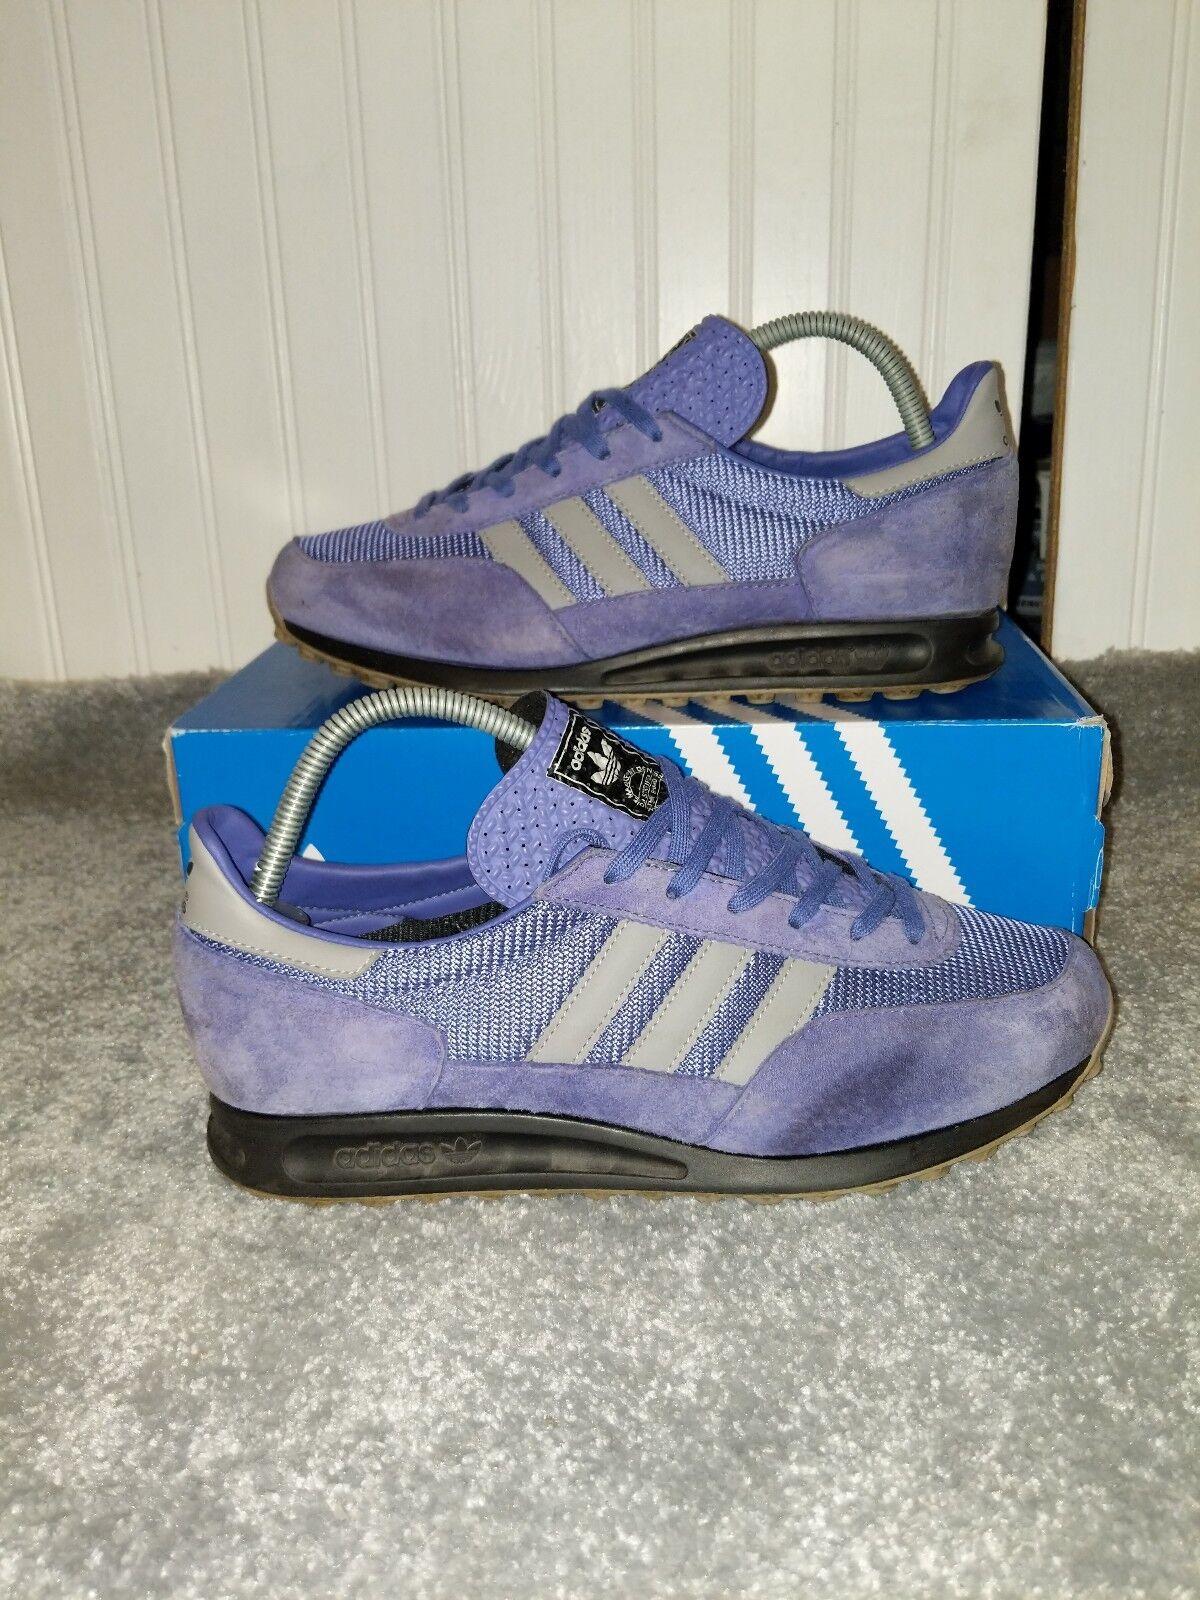 Adidas TRX Violet Taille 8 (Deadstock, McVicar, Spezial, Malmo)